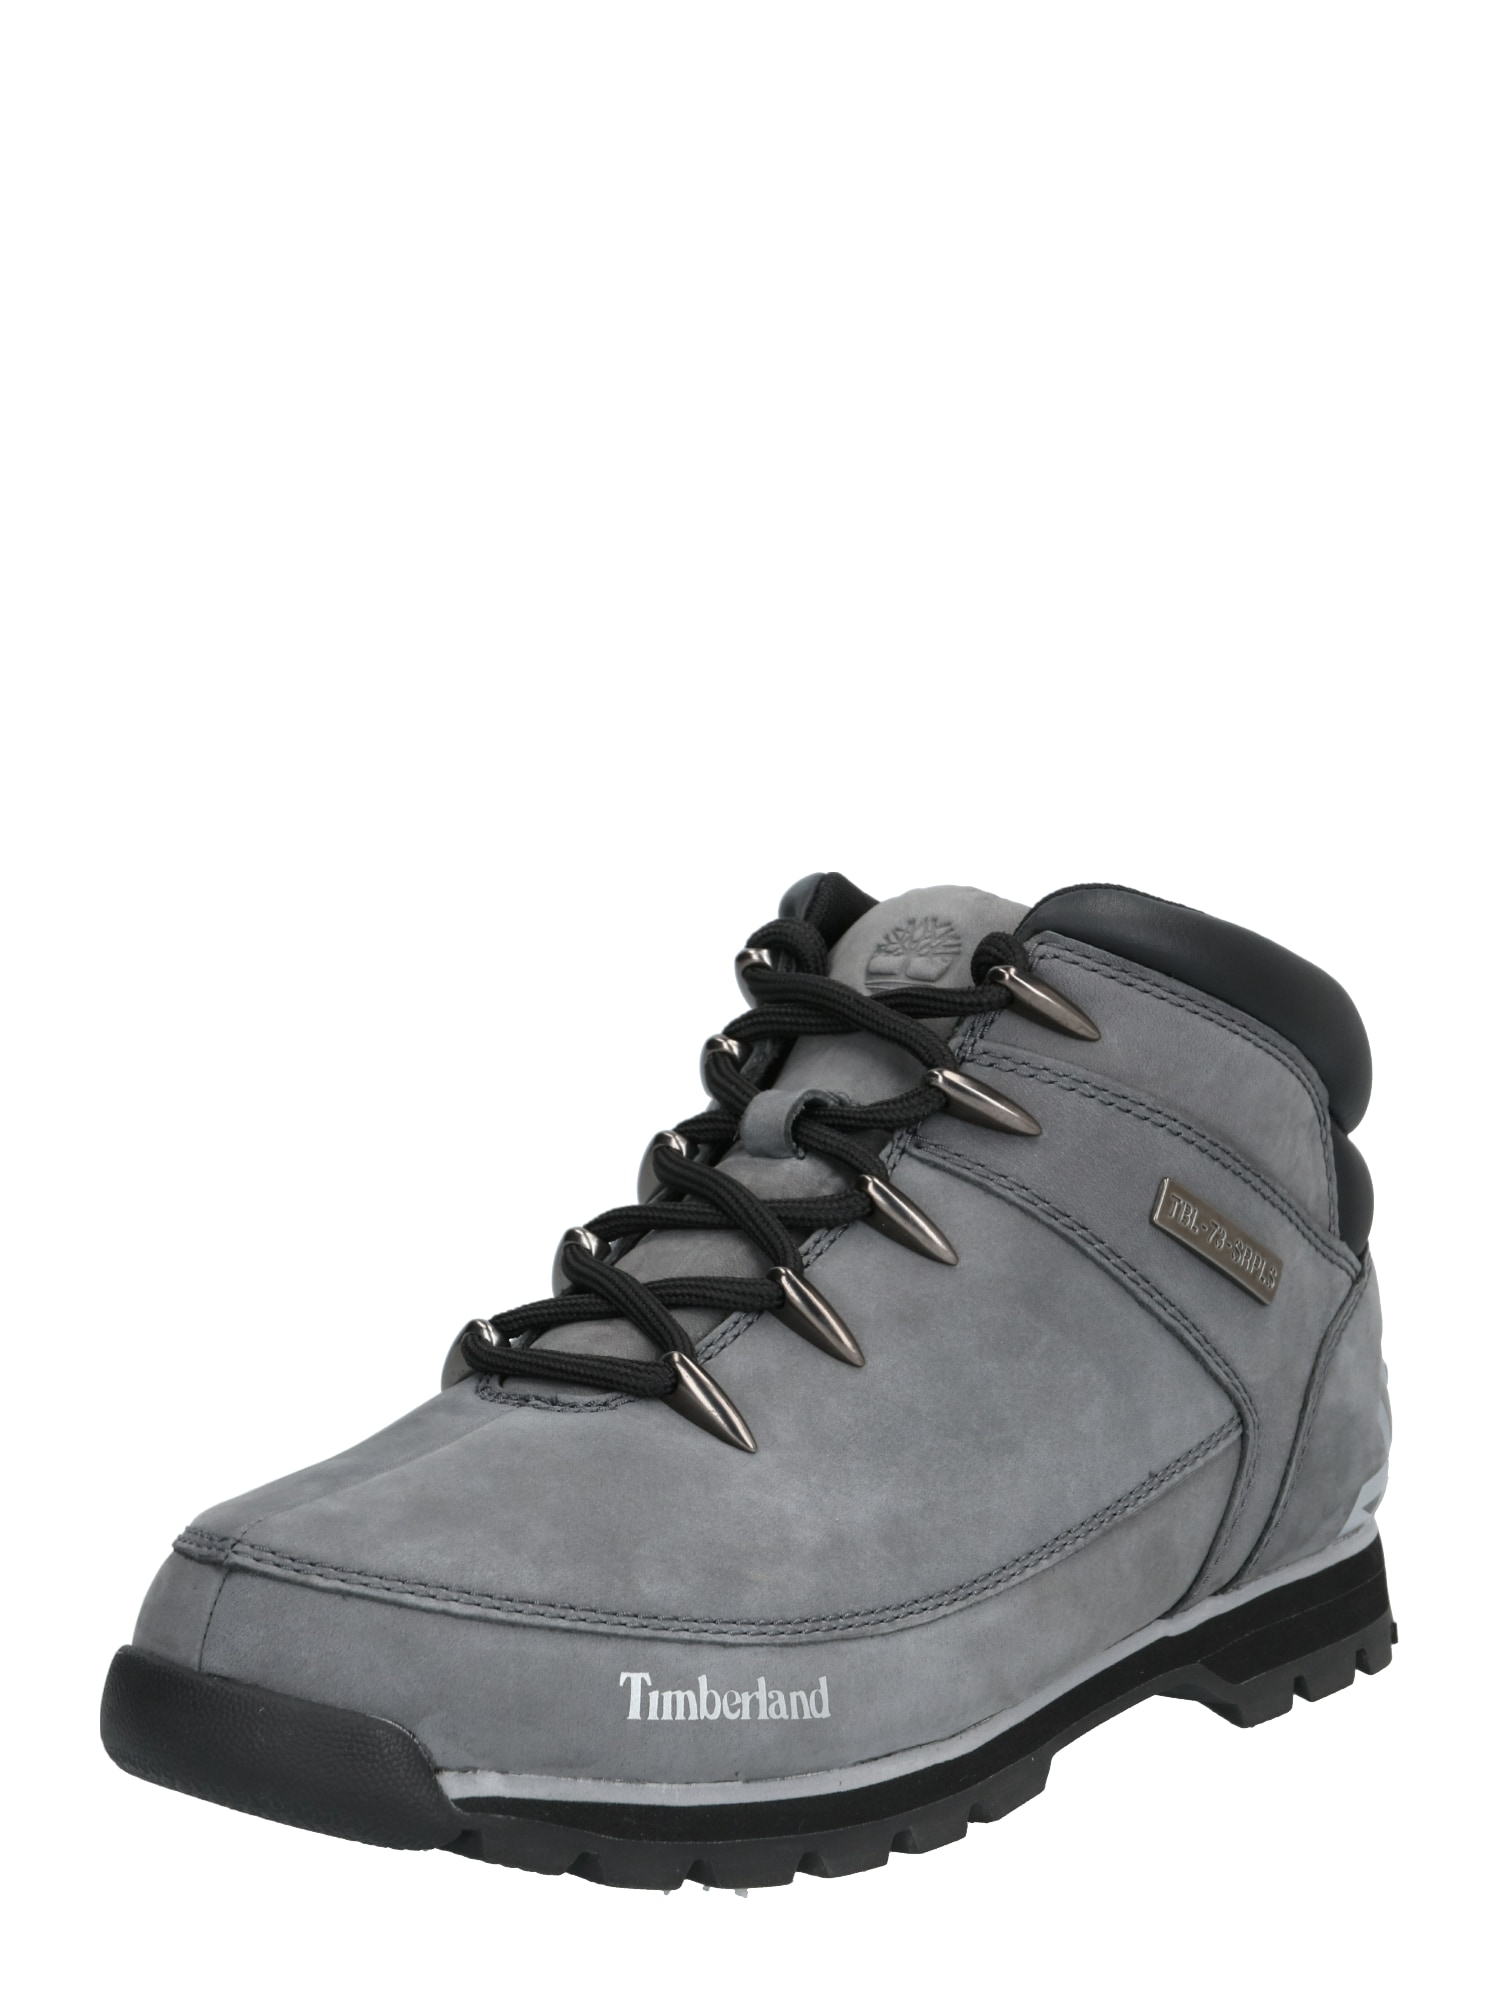 Herren Timberland Stiefel 'Euro Sprint Hiker' blau, gold,  grau, grau, pink | 00888658717378